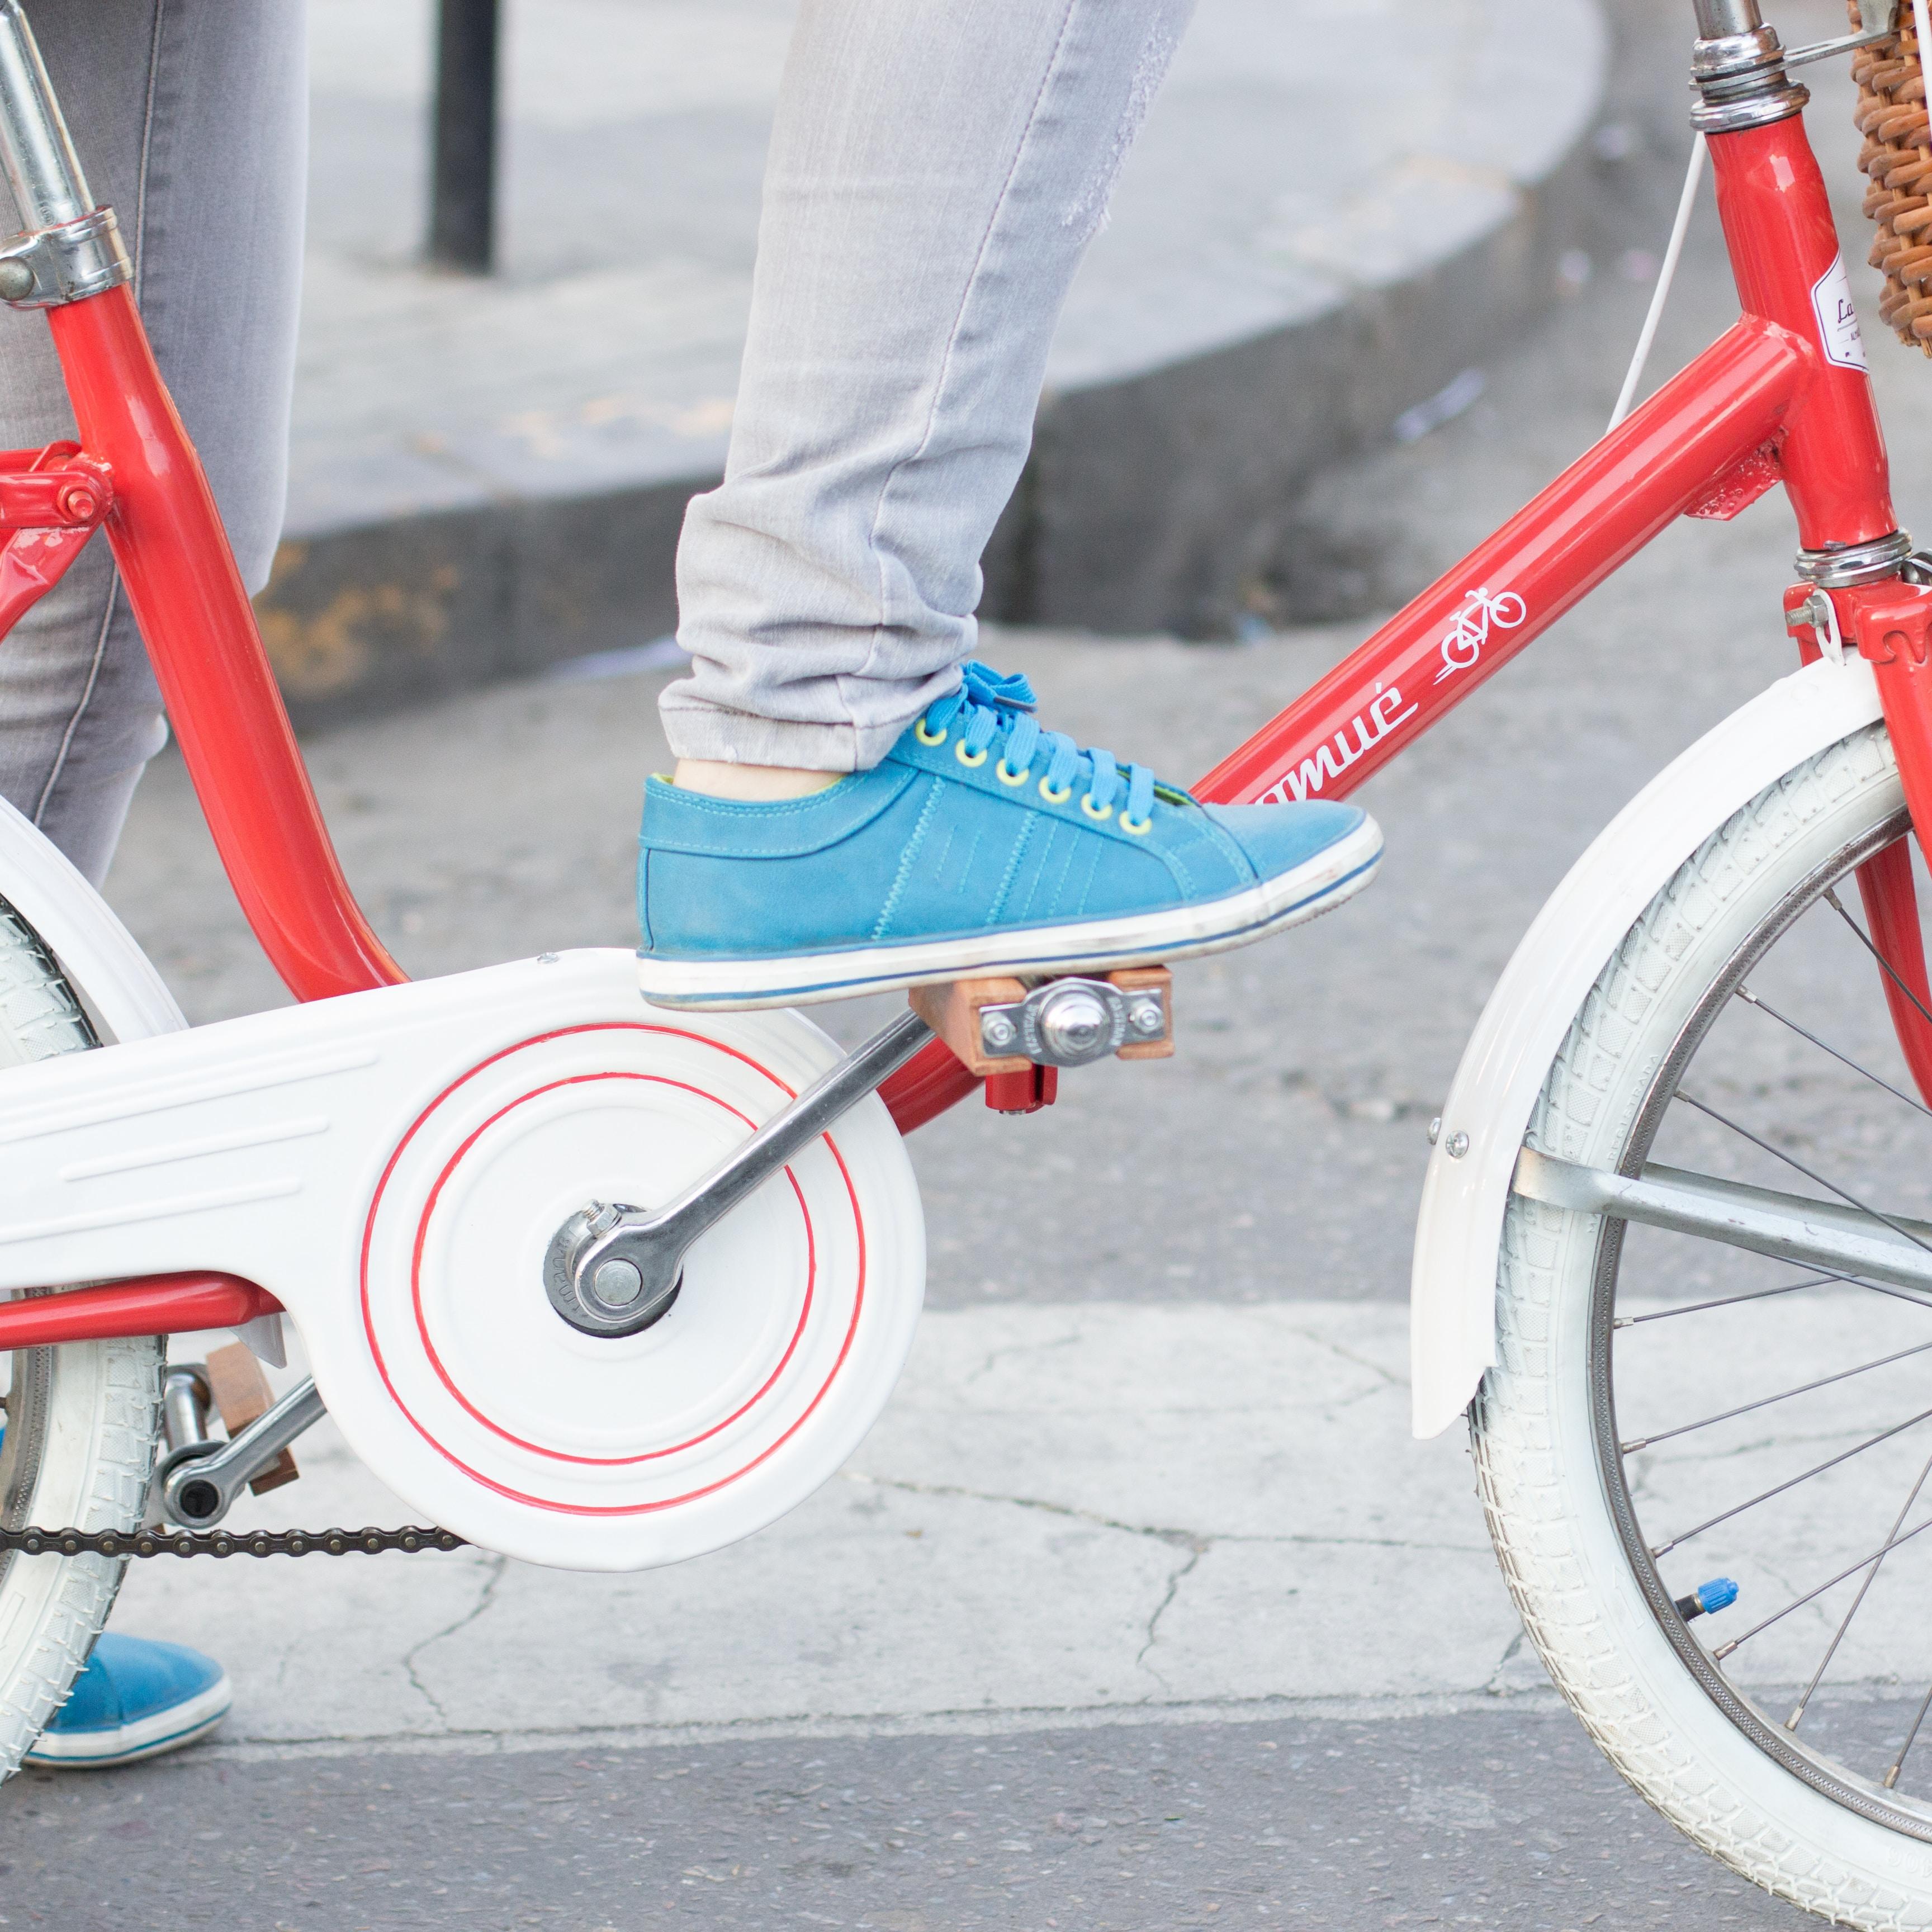 Dance raises another .4M for its e-bike subscription service